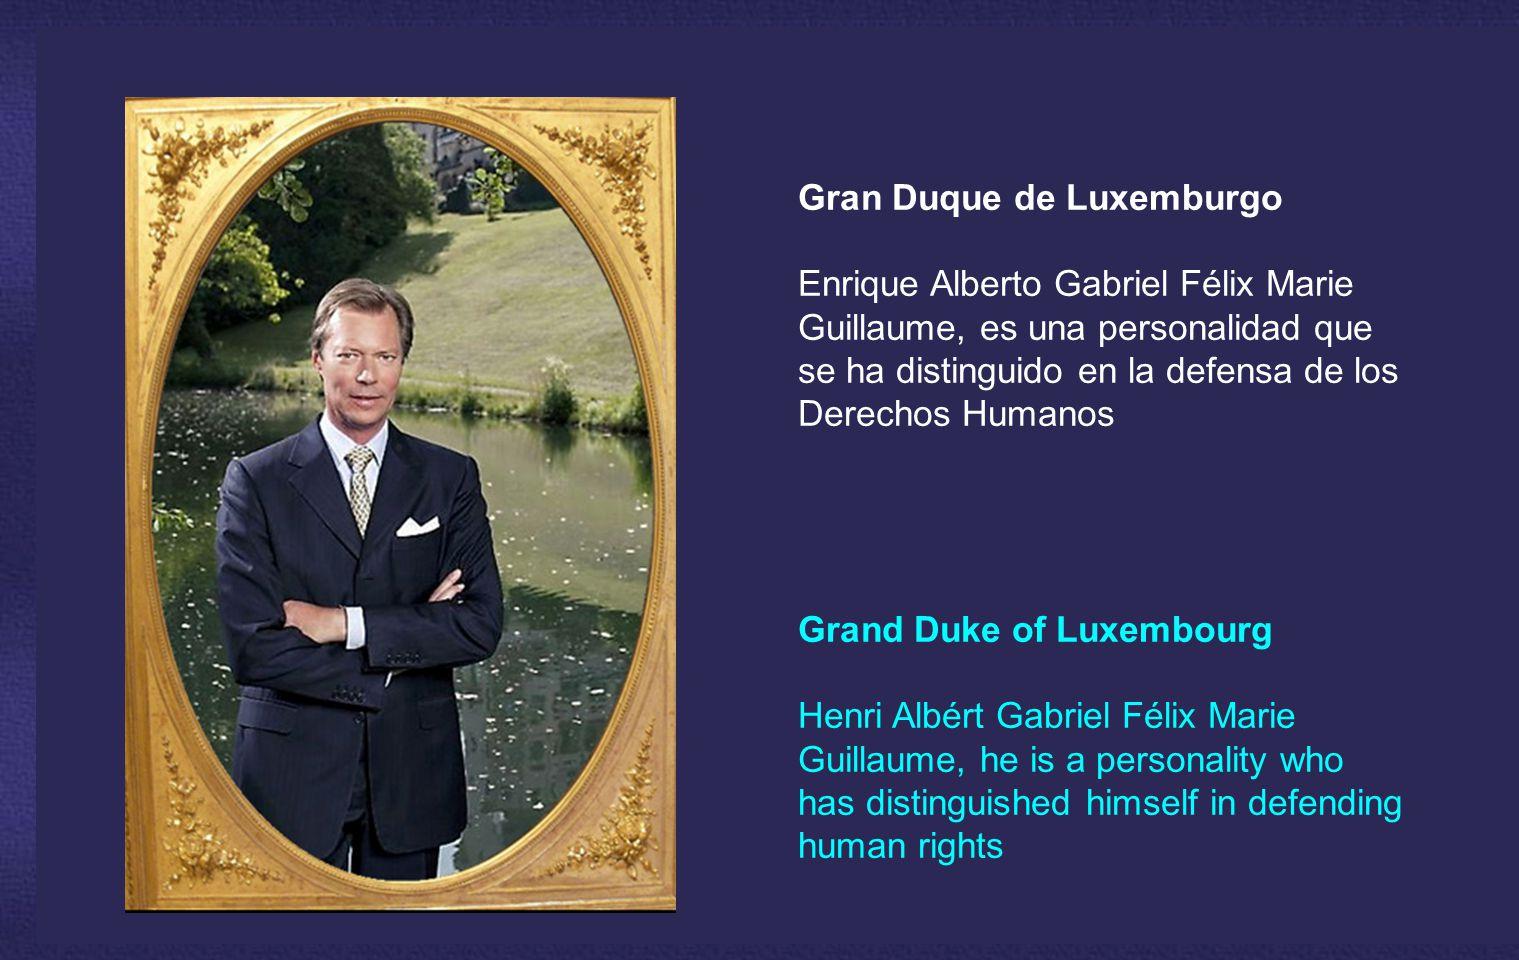 Gran Duque de Luxemburgo